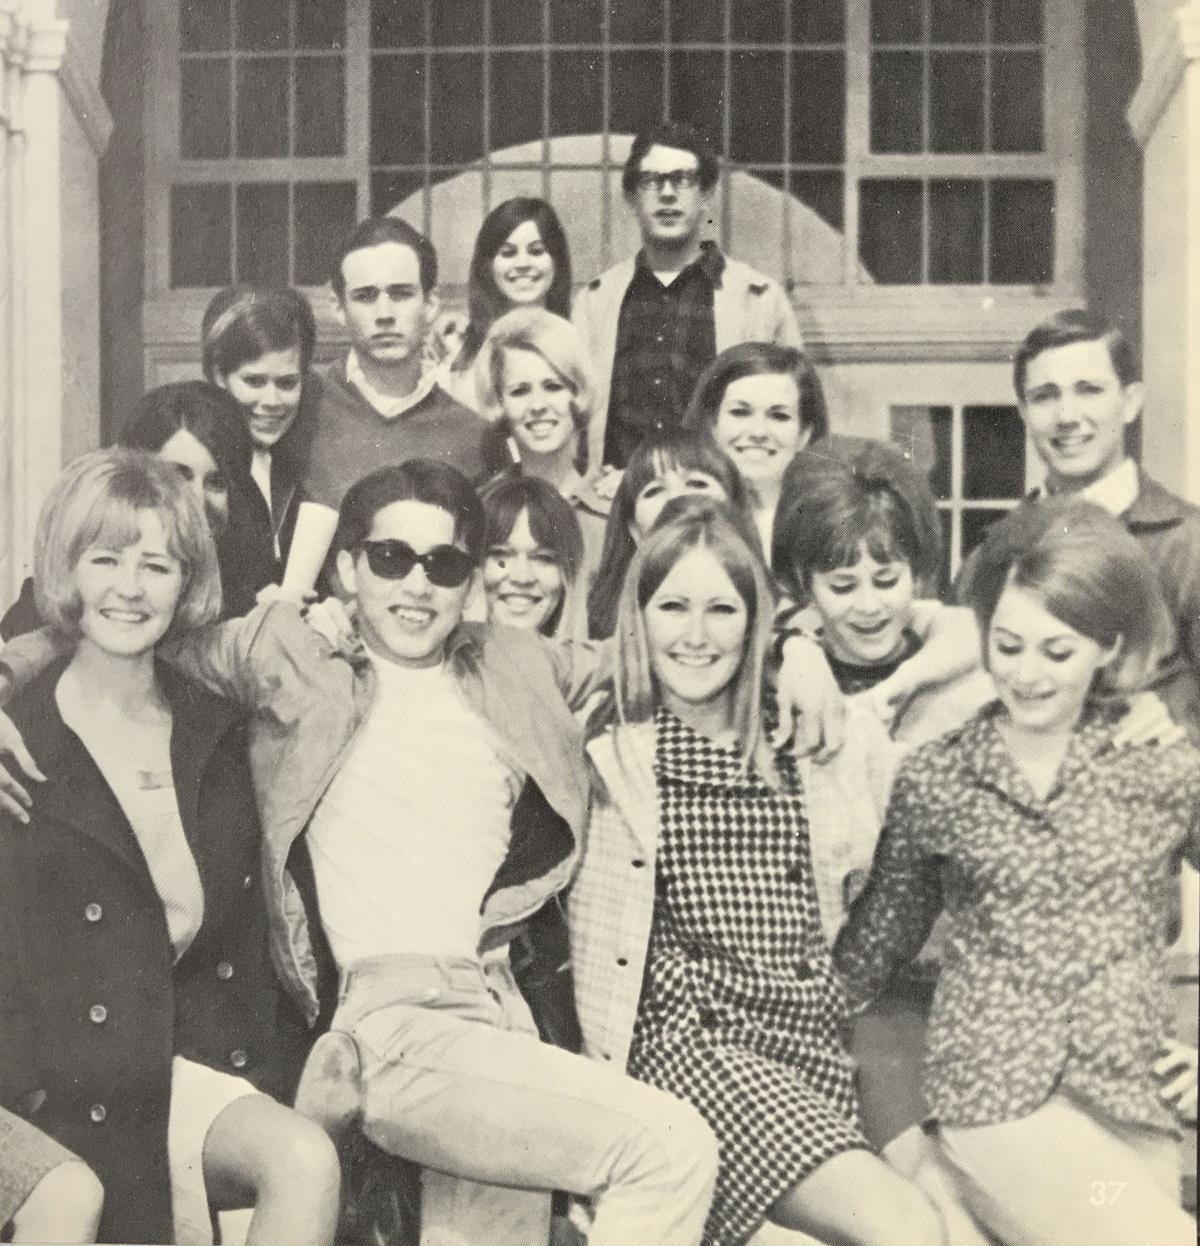 082118 1968 SMHS reunion 02.jpg